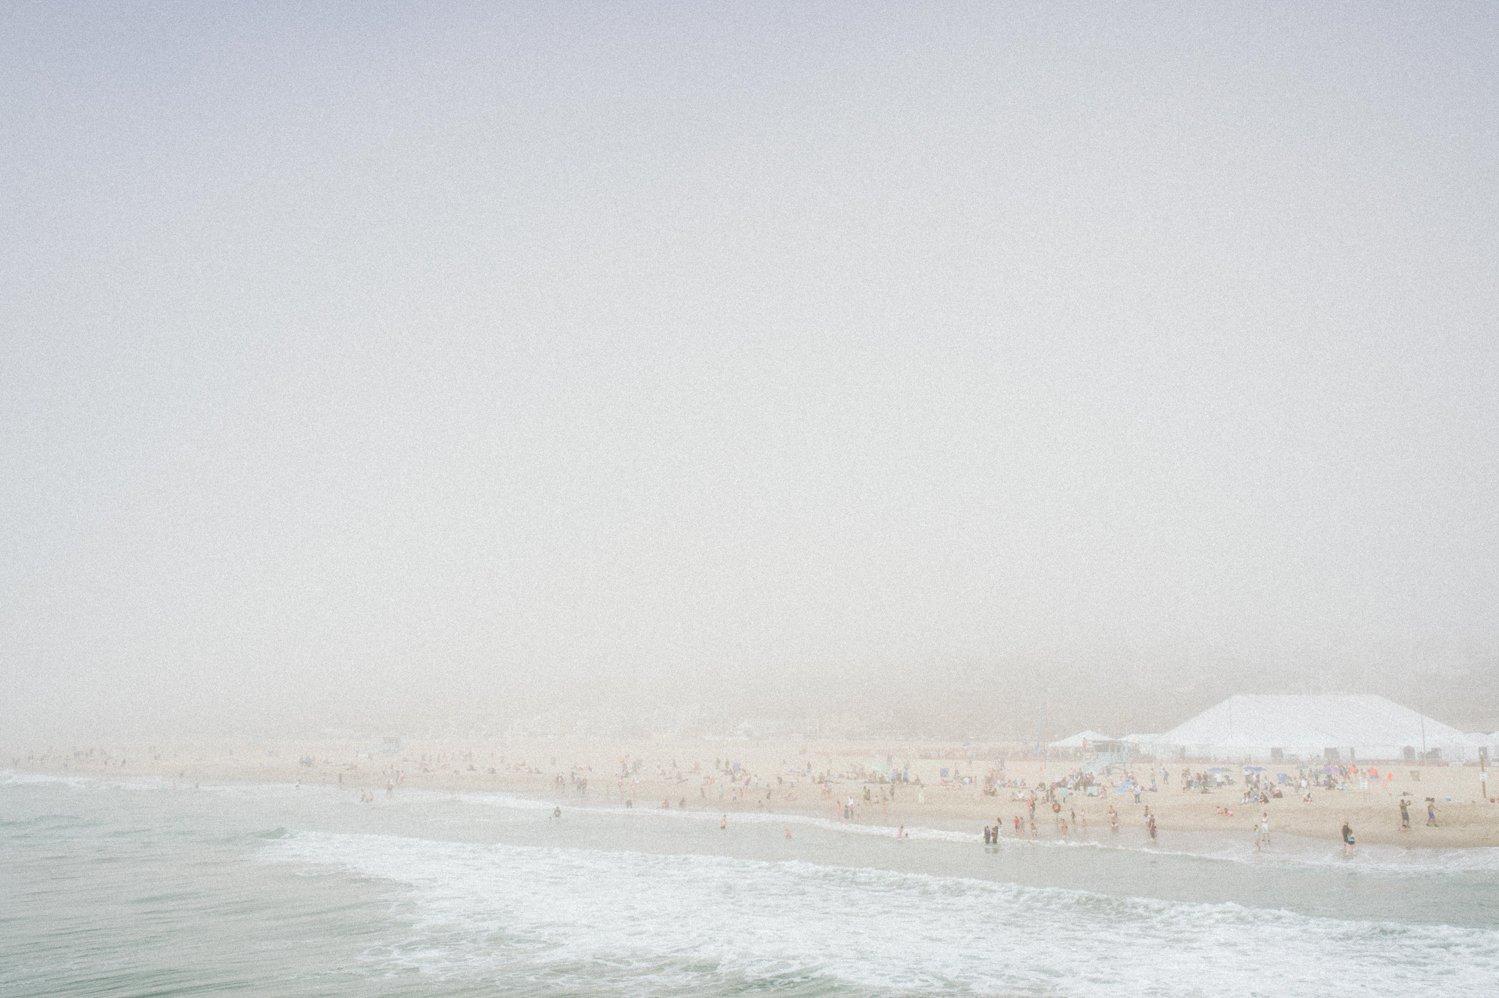 USA ROADTRIP TRAVEL PHOTOGRAPHY-201